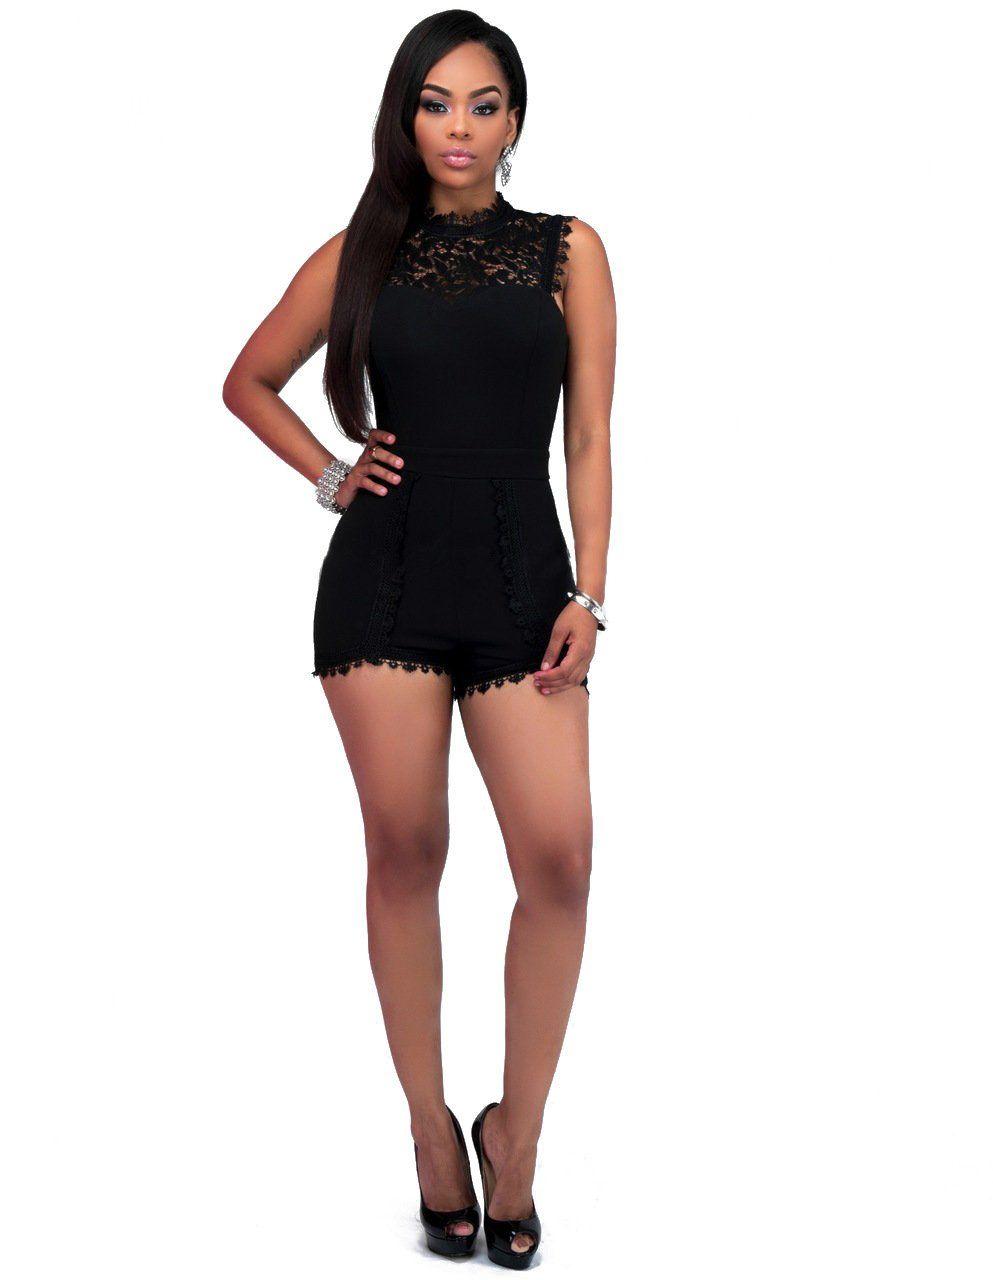 426038b6e7e Lace Patchwork Sexy Summer Women Jumpsuits Rompers Shorts Bodysuit Overalls  For Women Plus Size Black Elegant Playsuit Ladies